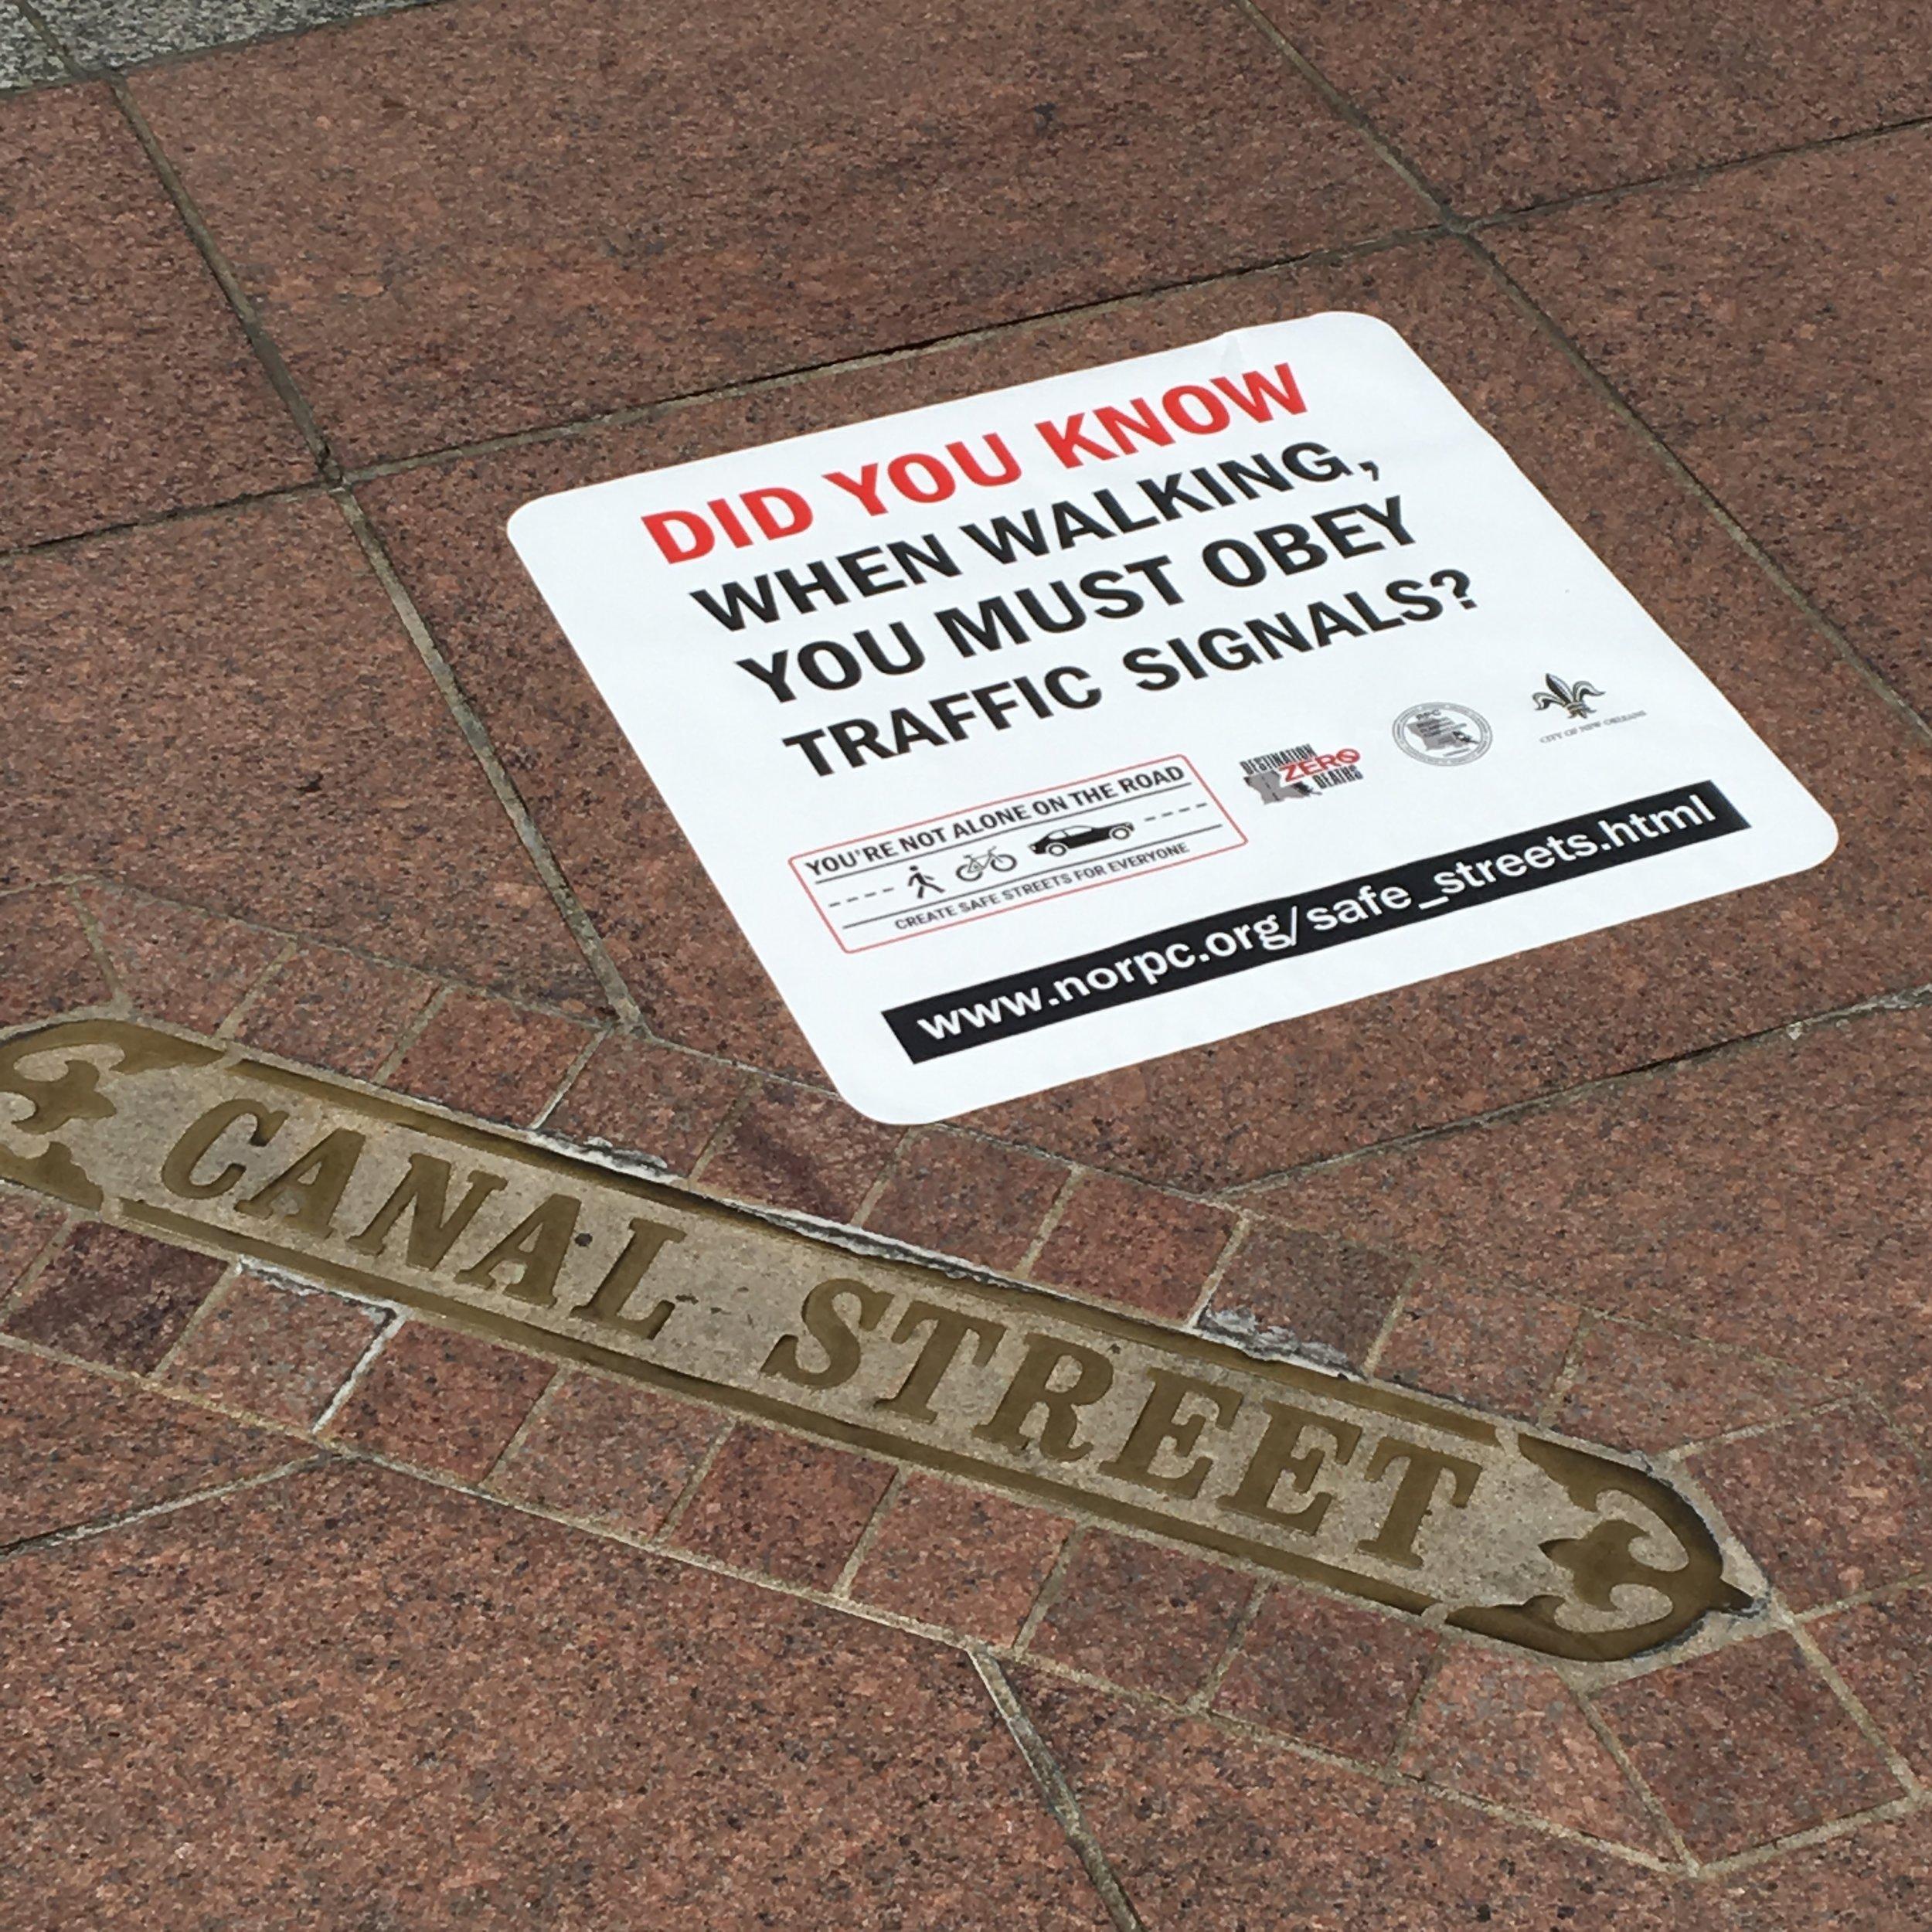 Cool Sidewalk Graphic